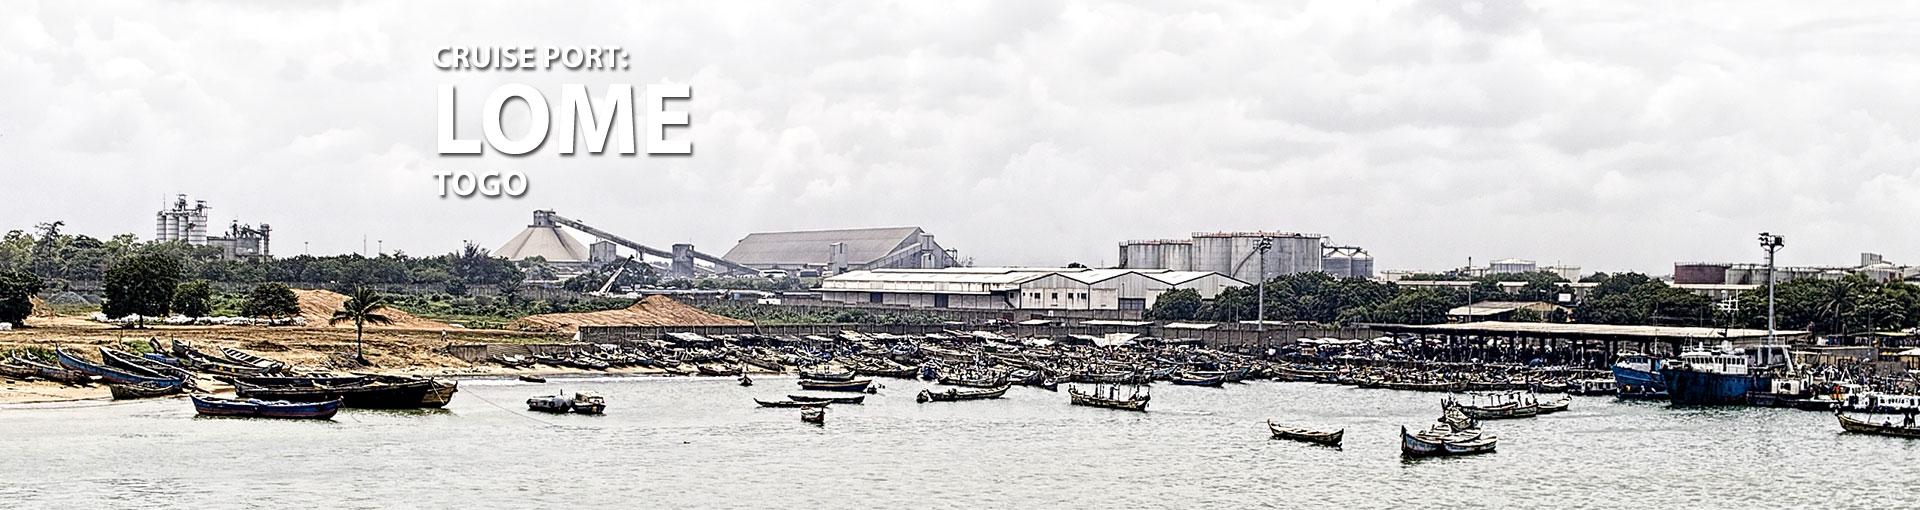 Cruises to Lome, Togo